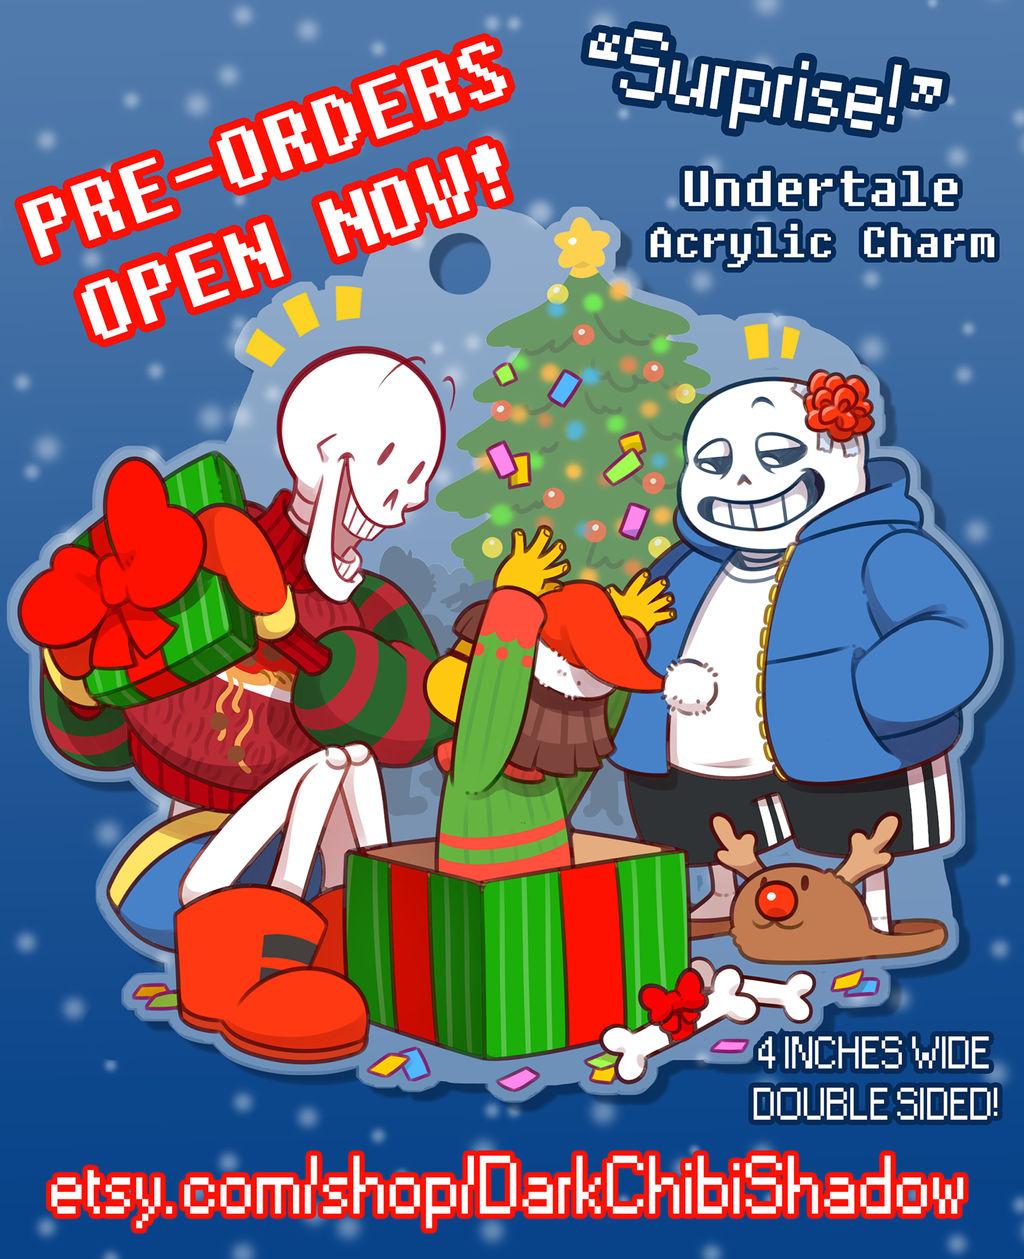 'Surprise!' Undertale Charm [PRE-ORDERS] by DarkChibiShadow